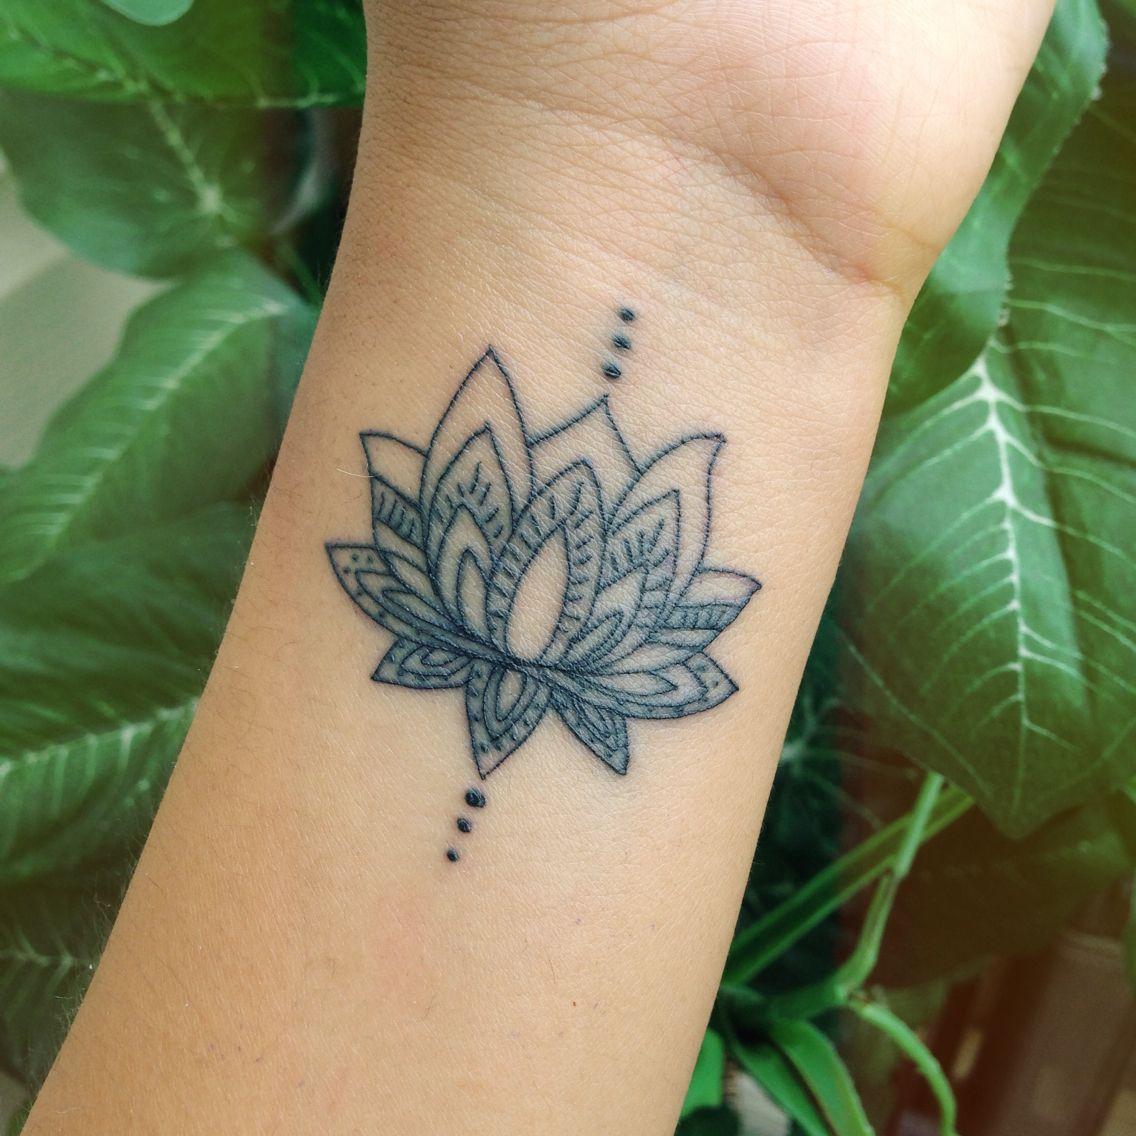 40 Awesome Wrist Tattoo Ideas For Inspiration Lotus